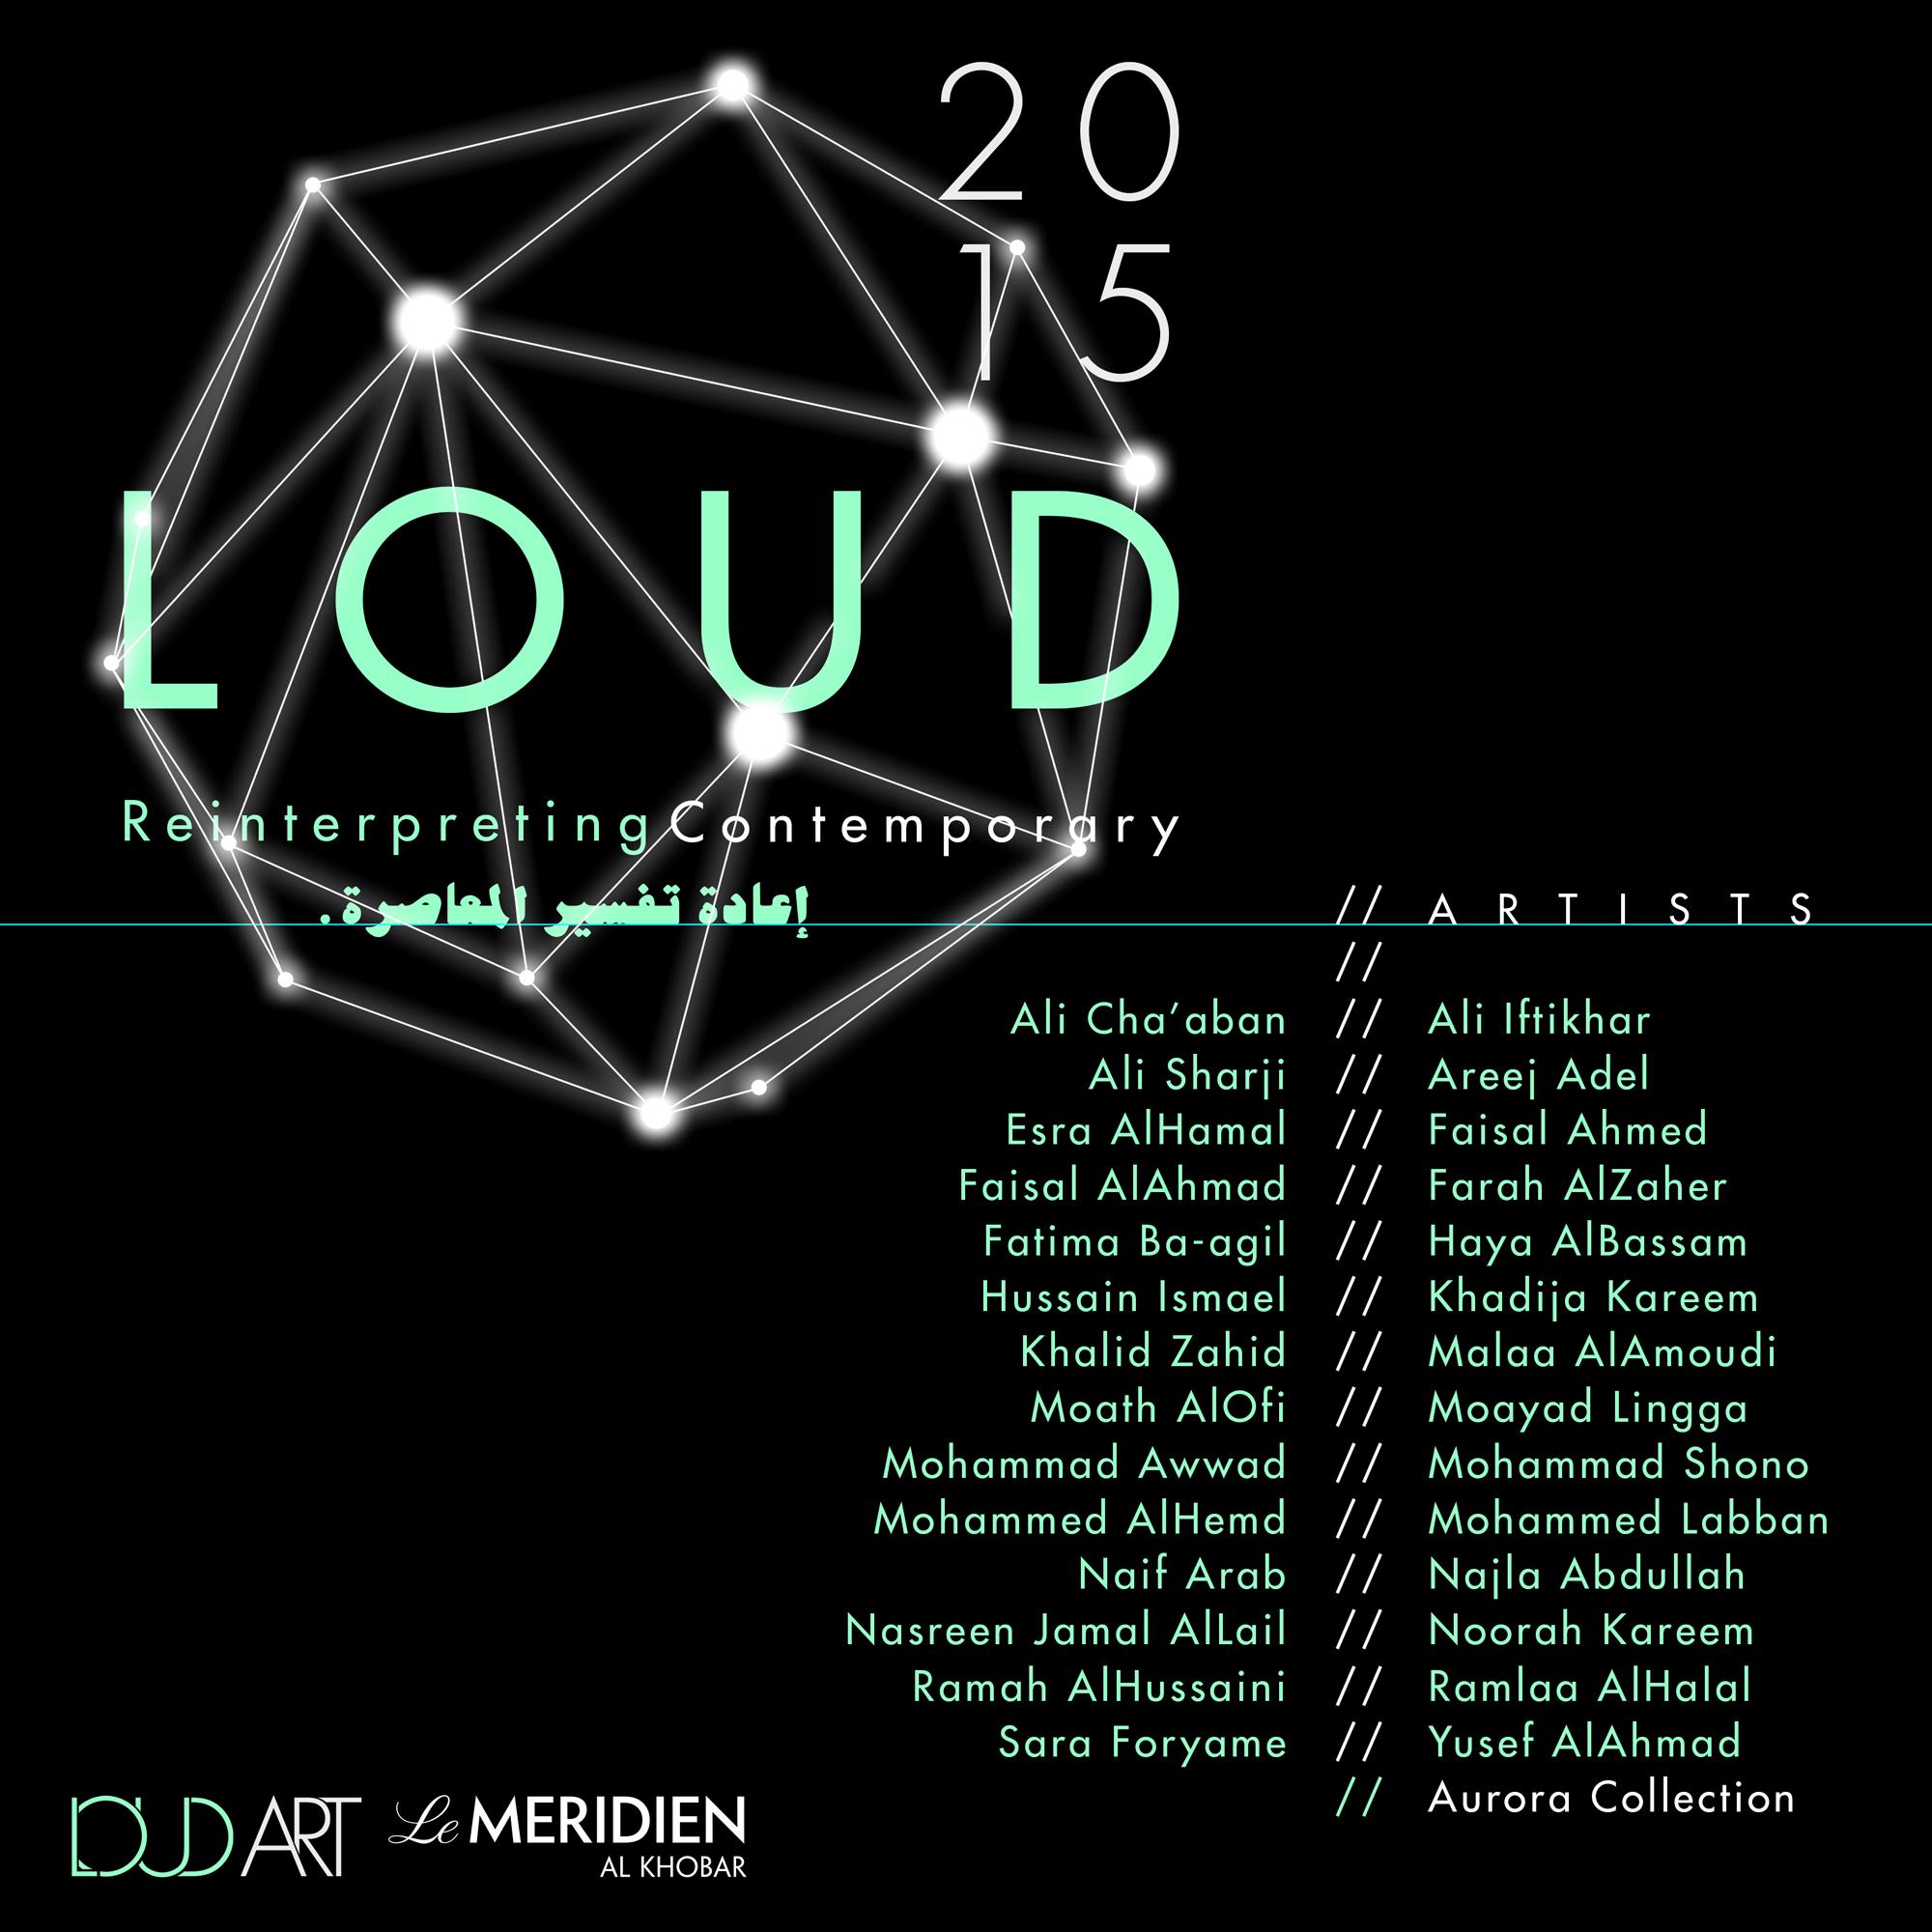 Artists list for Loud Art 2015